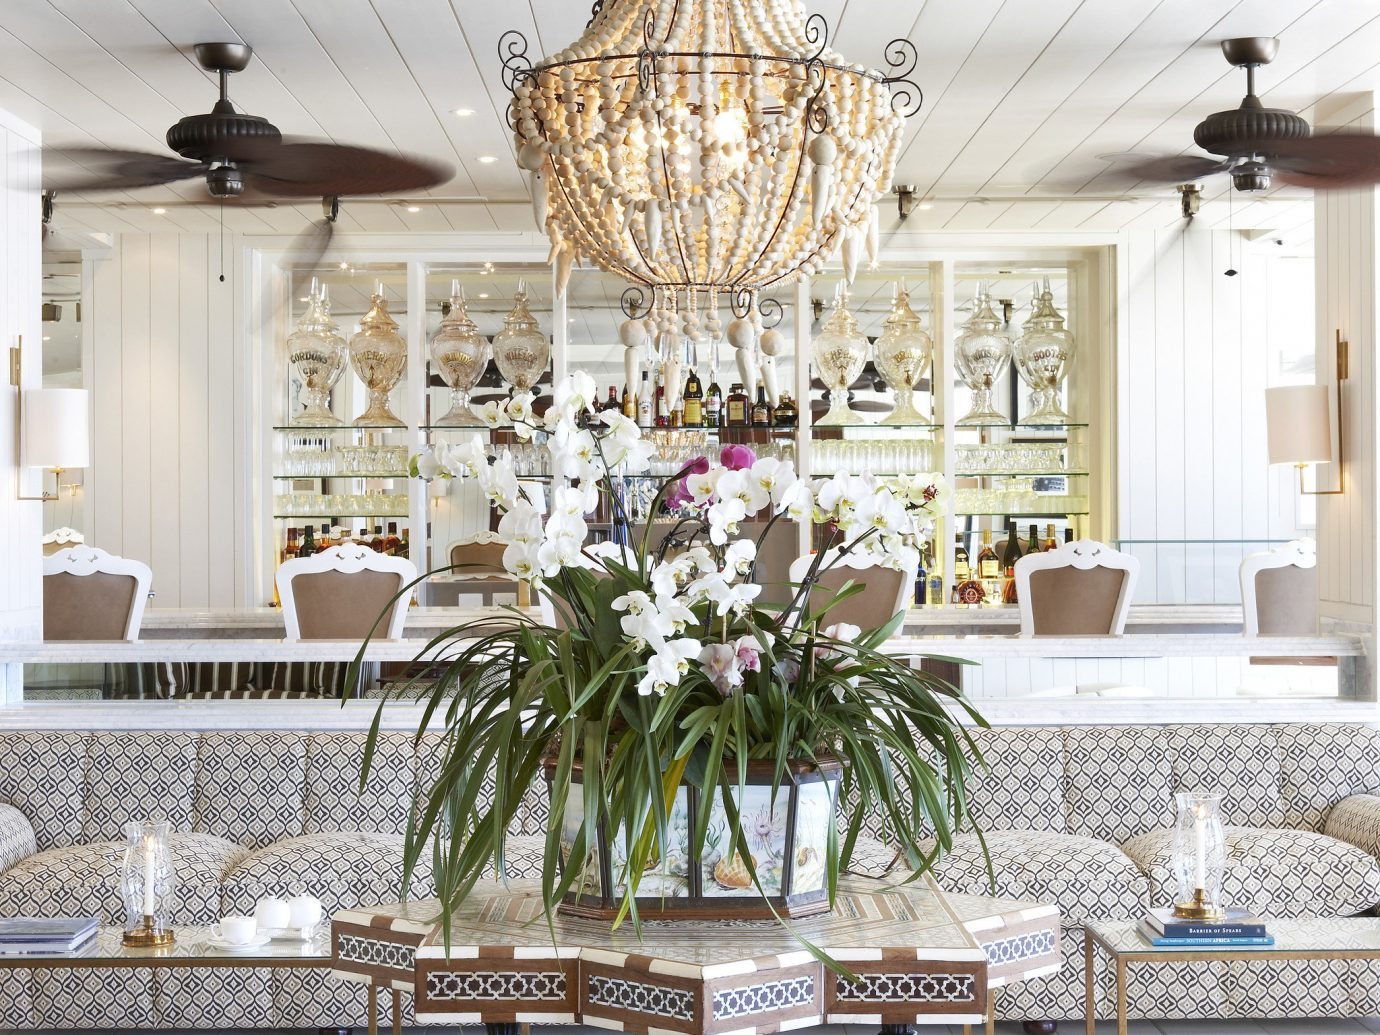 Hotels dining room room interior design lighting floristry light fixture window covering estate